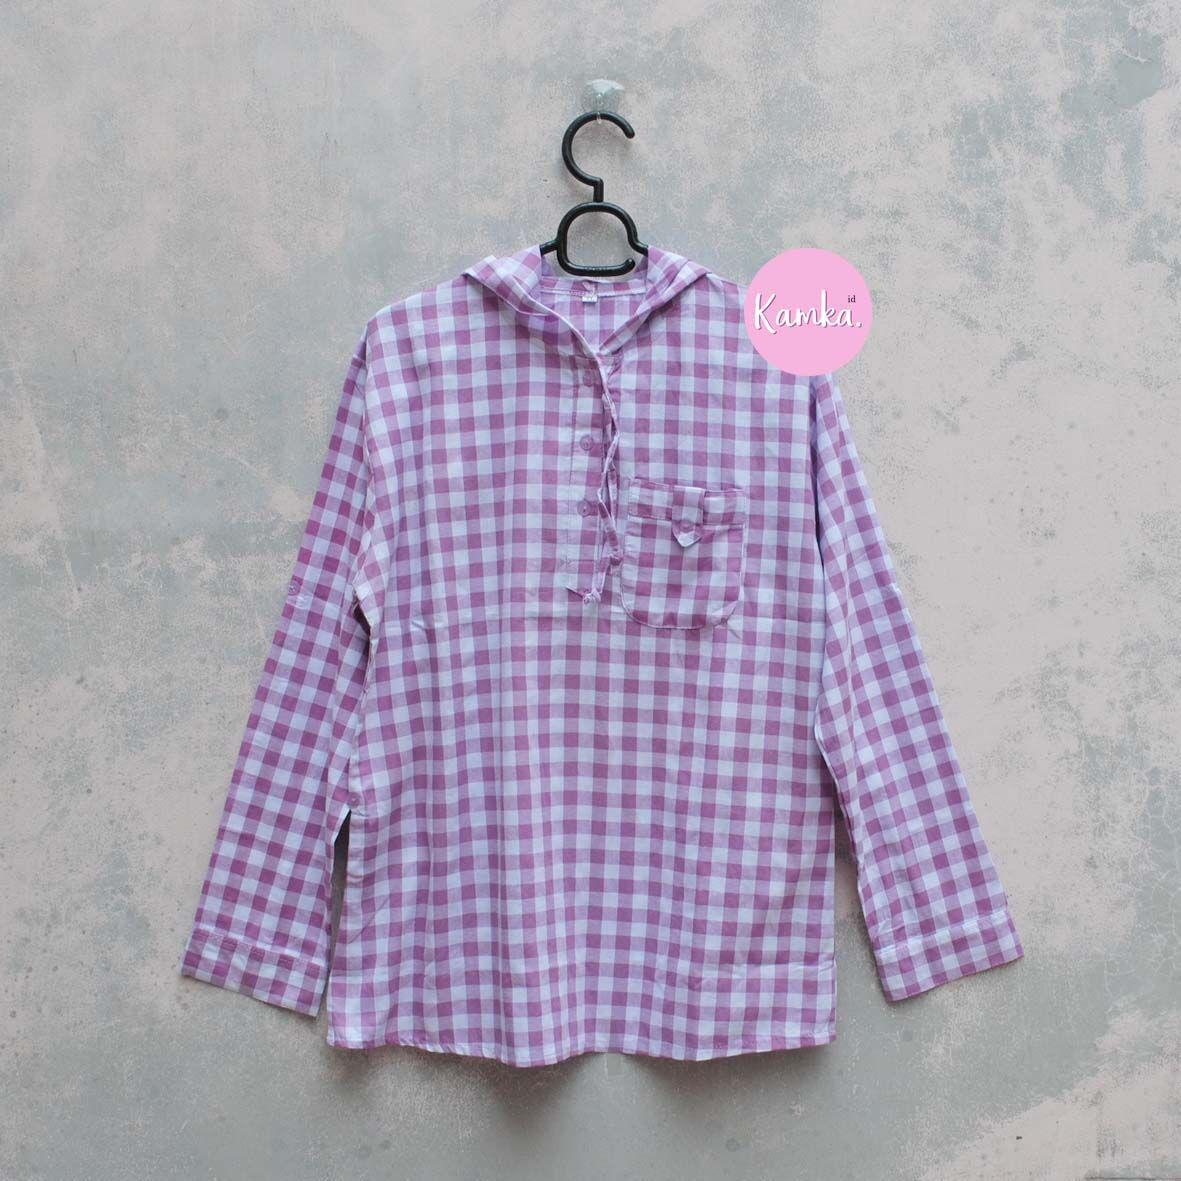 Jual blouse bahan katun murah garansi dan berkualitas  3ffd8cad4a